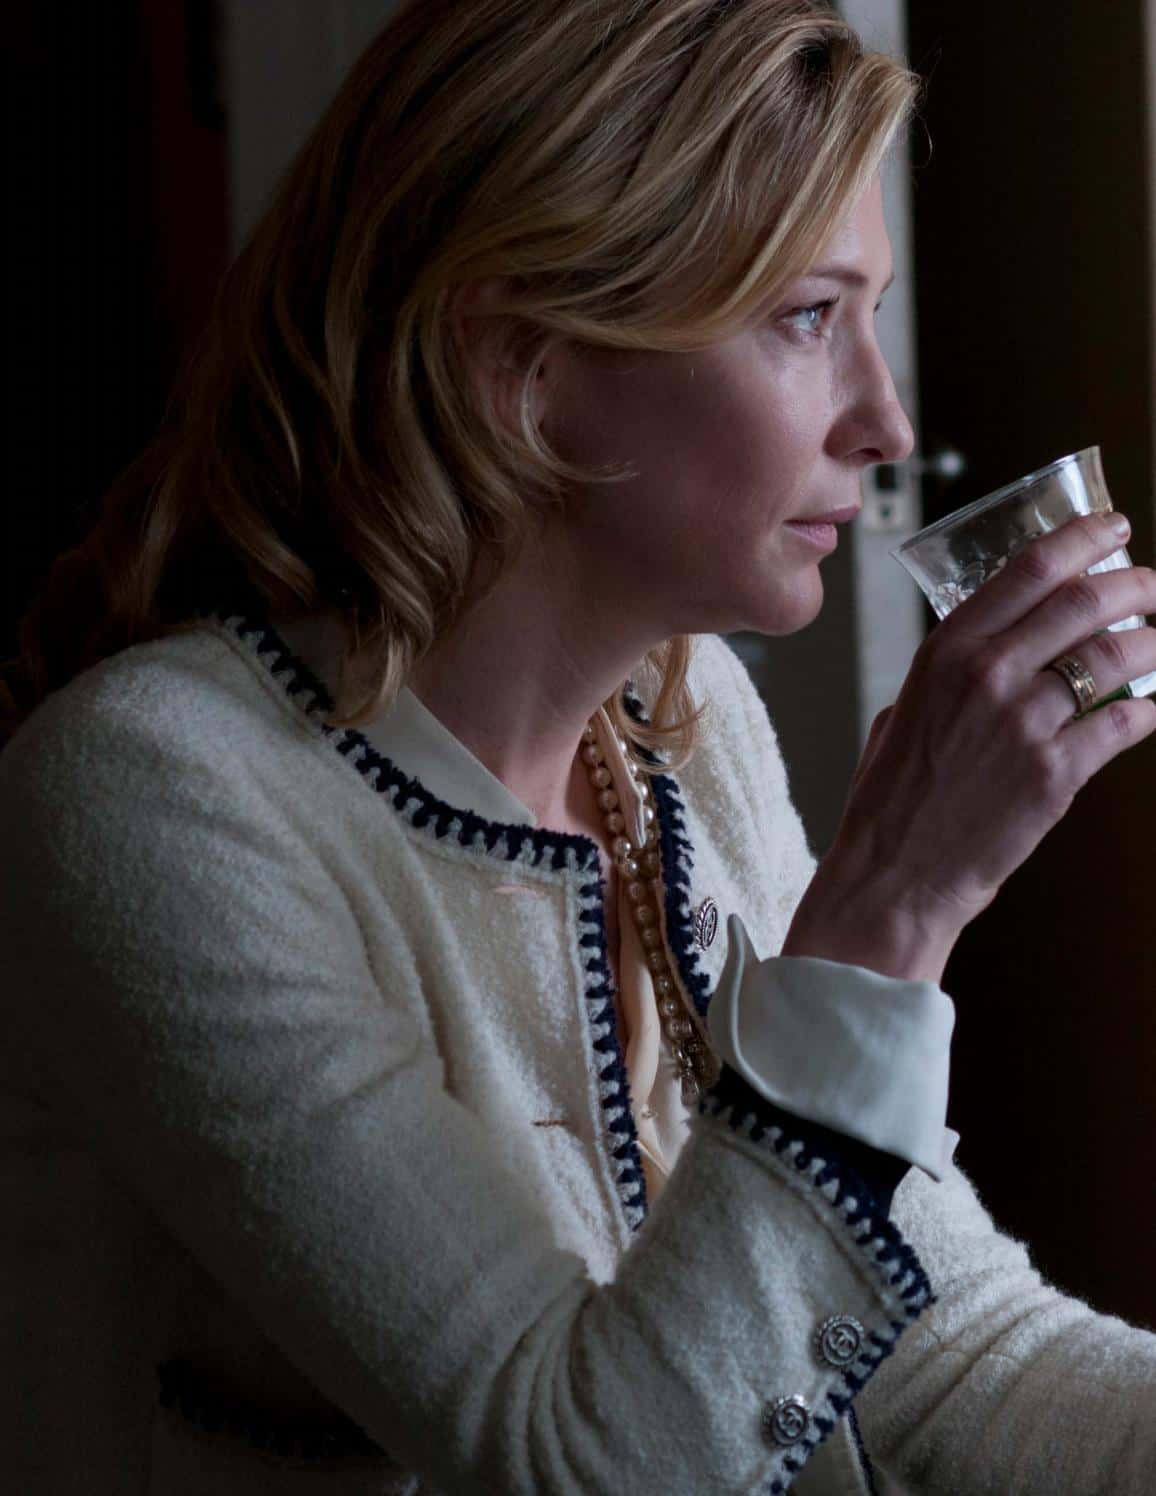 Cate Blanchett3, Hay una lesbiana en mi sopa